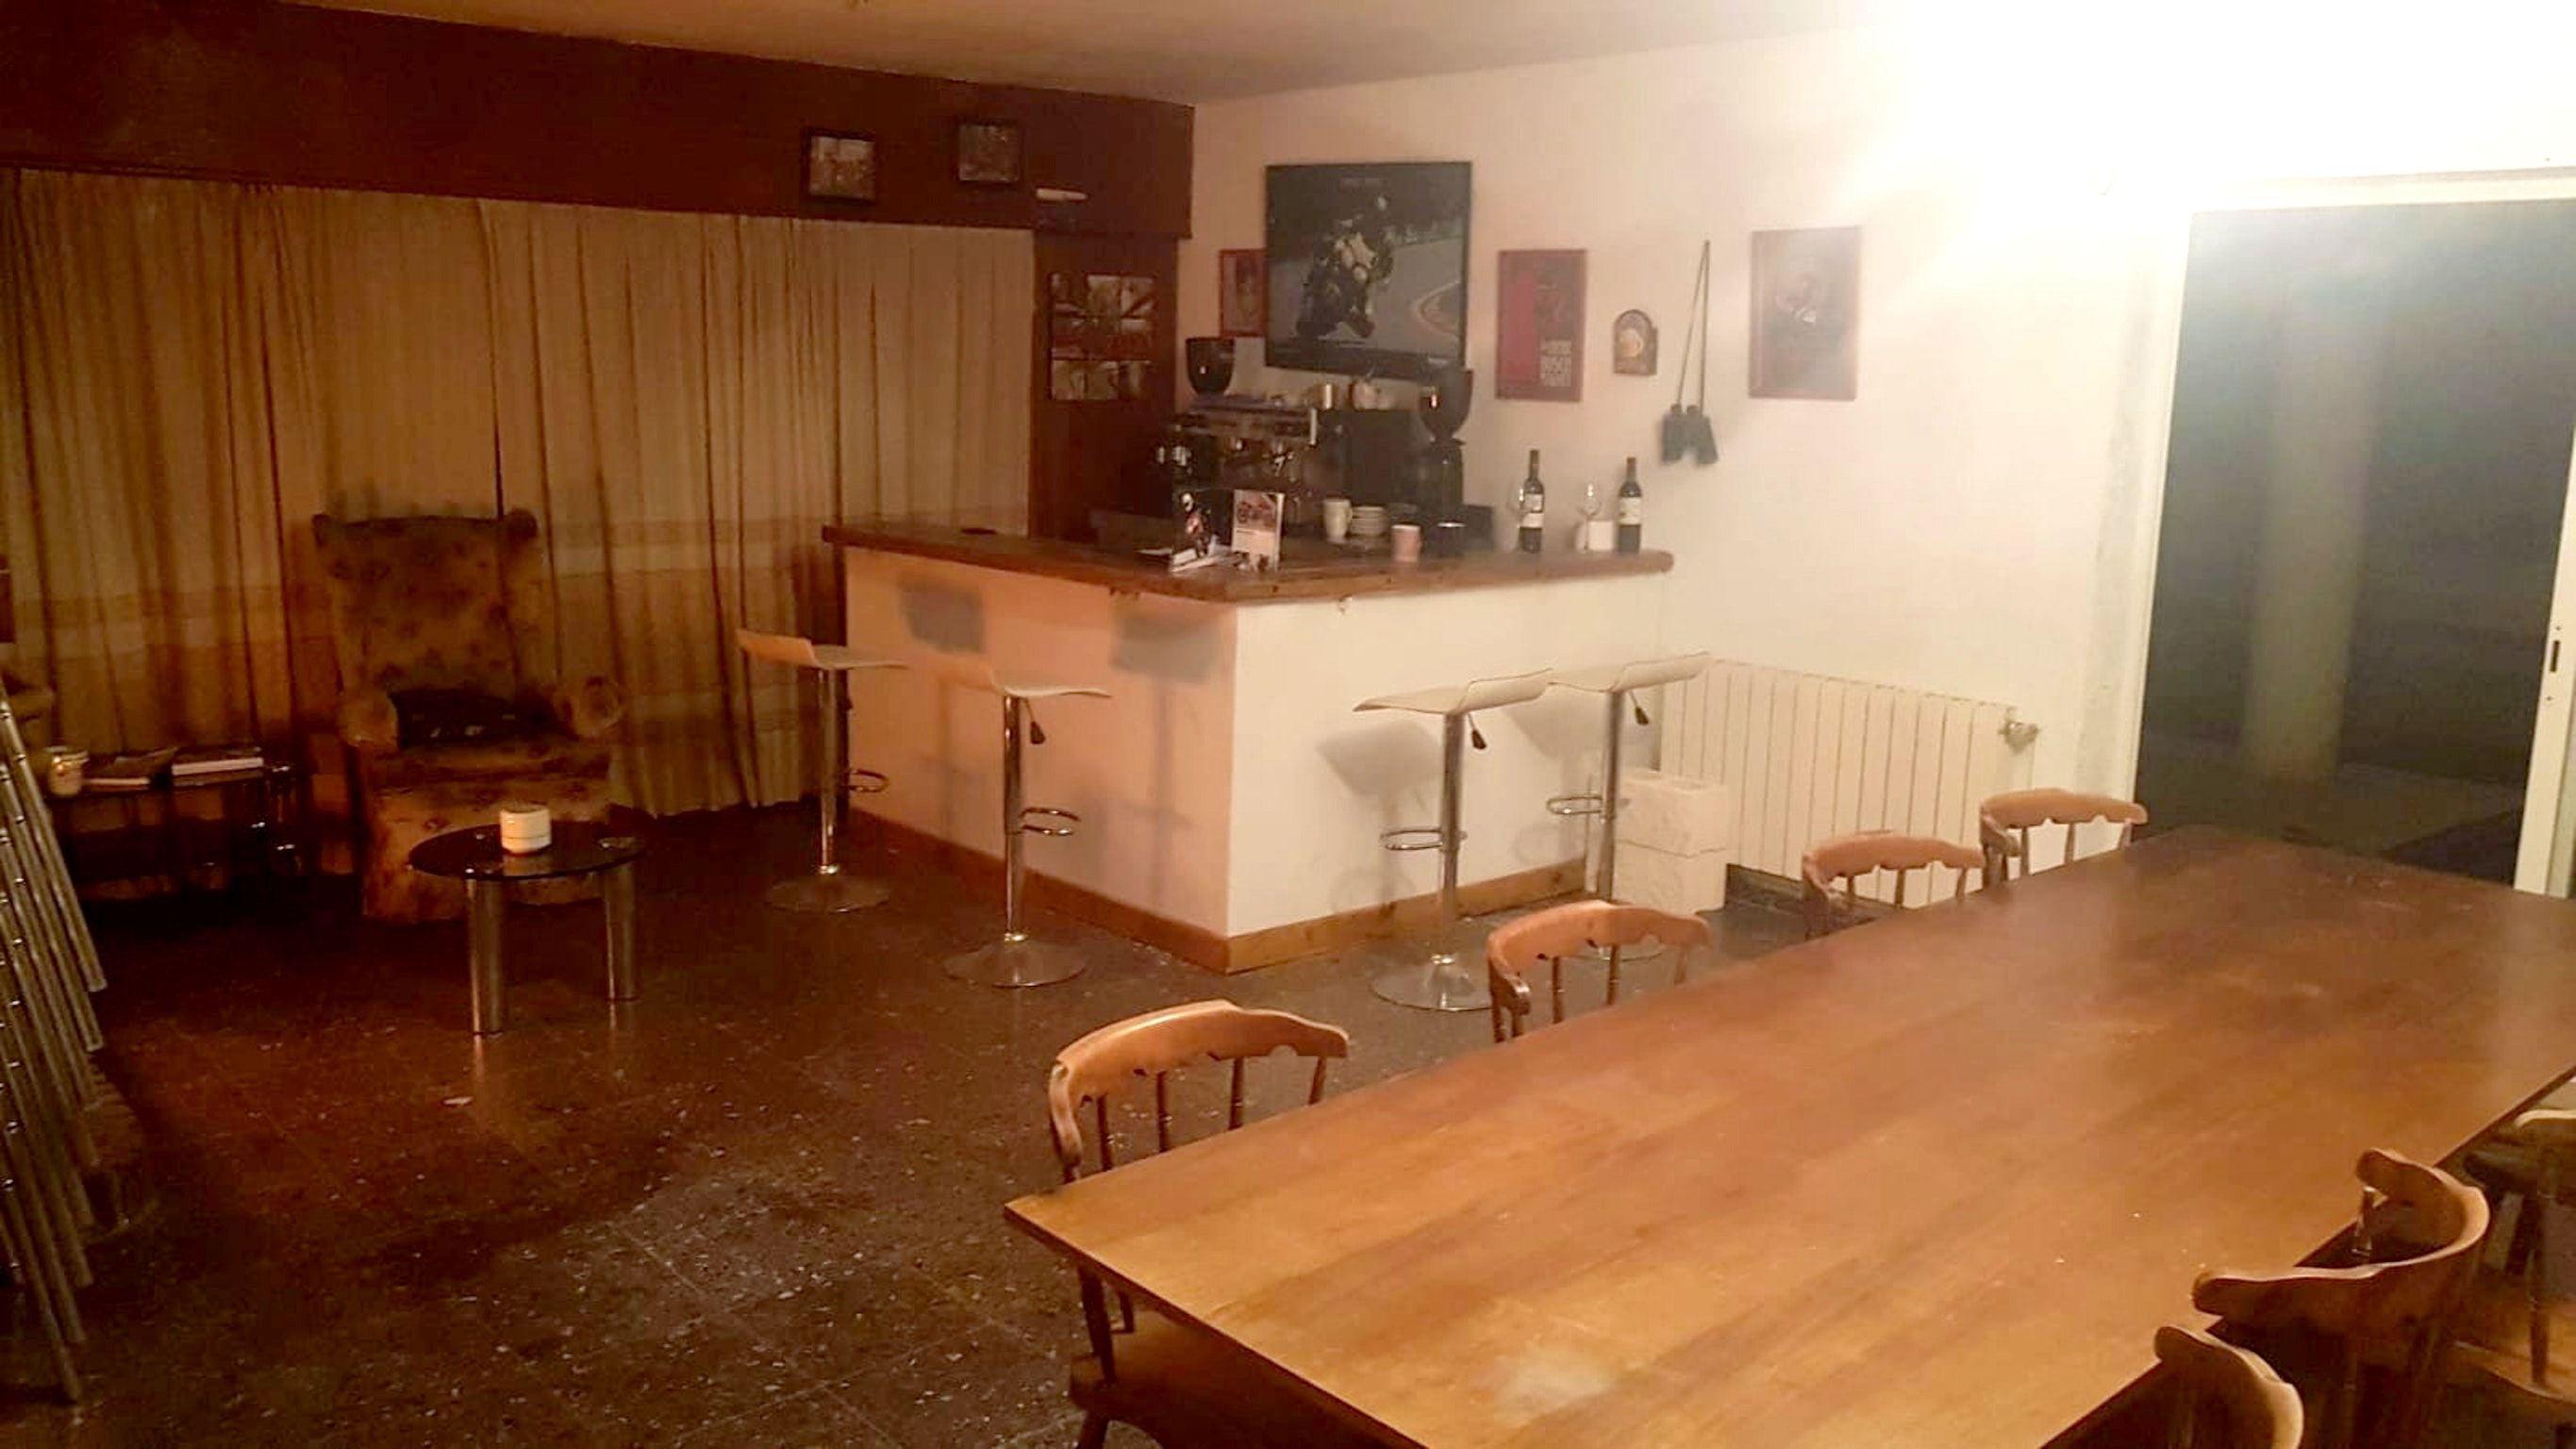 Venta De Baños | Wohnung Mit 2 Schlafzimmern In Venta De Banos Mit Pool Moblierter